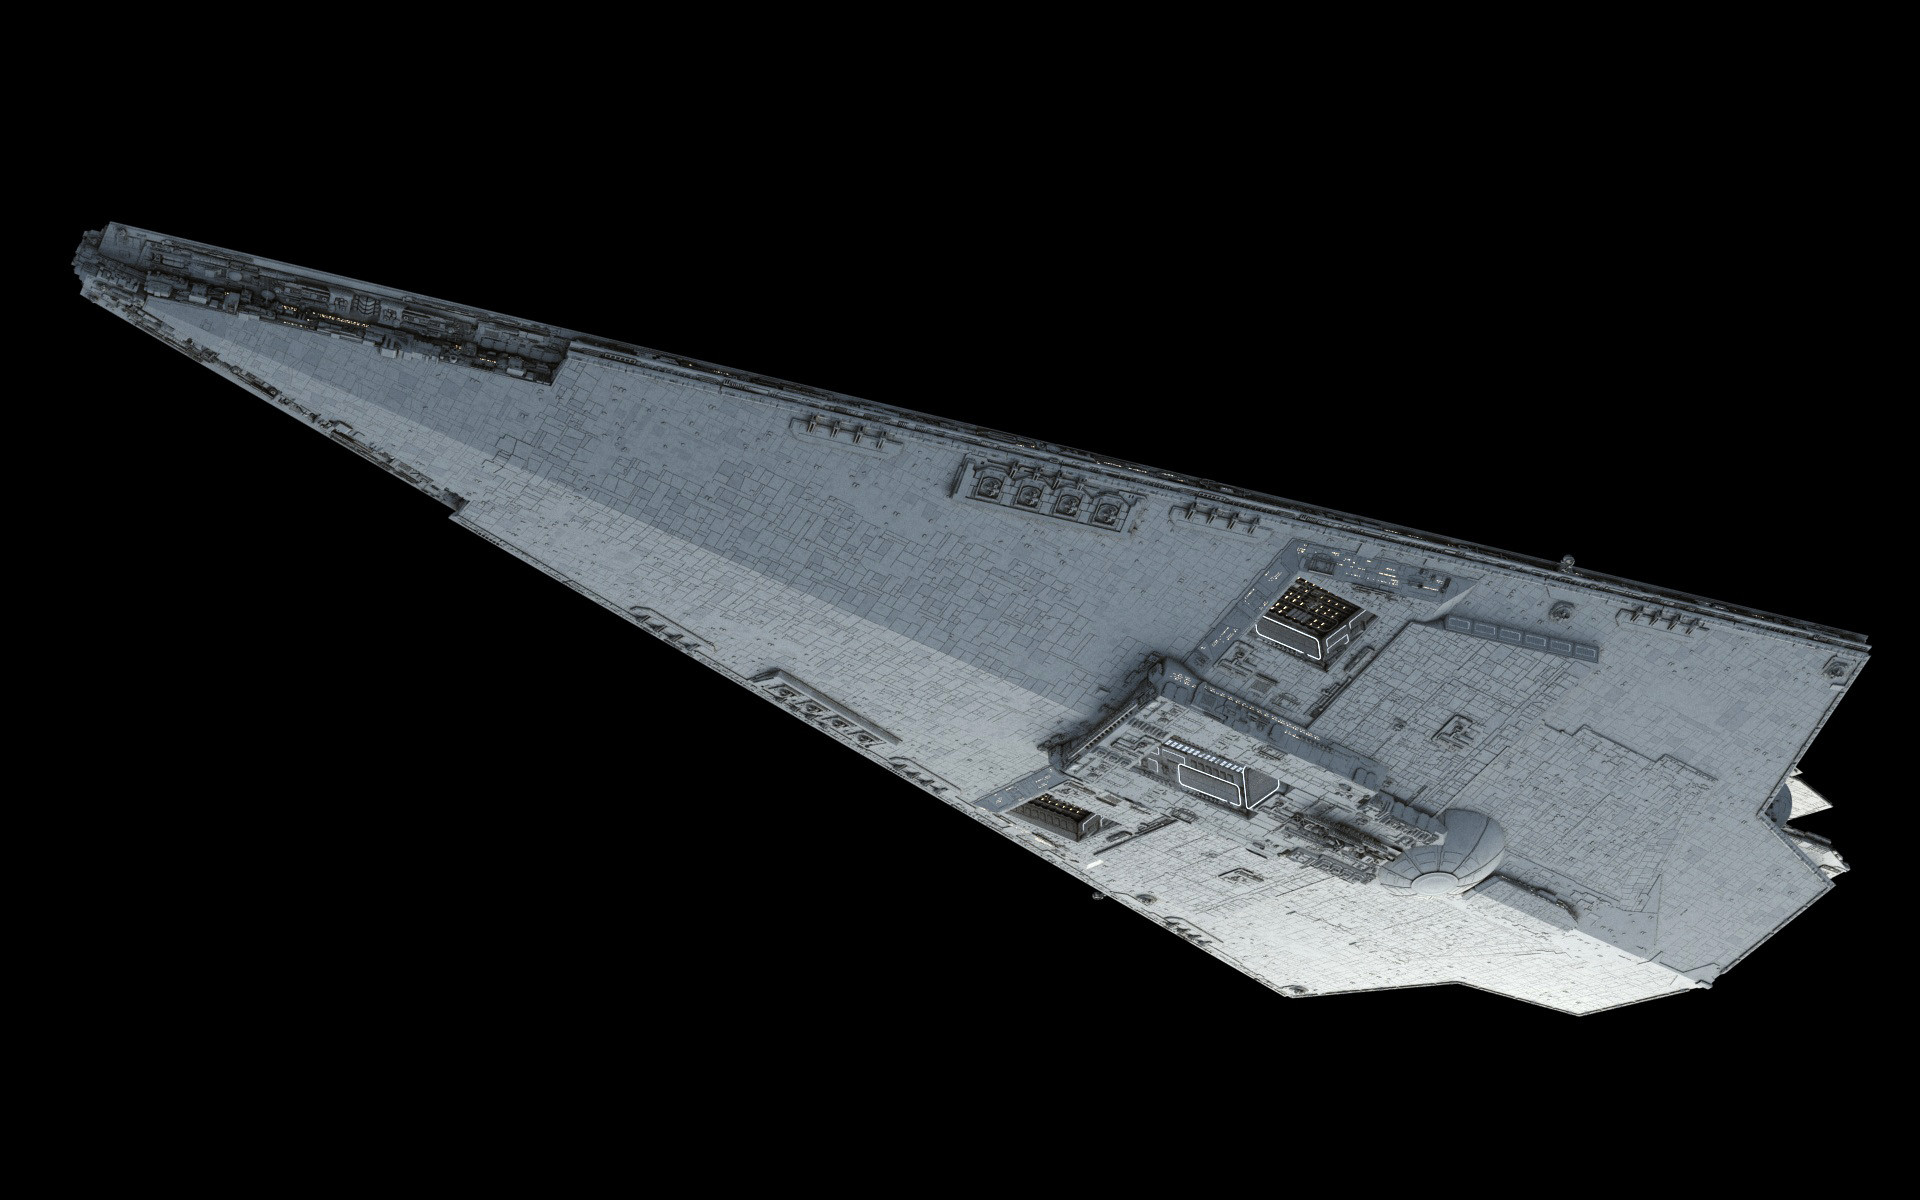 Ansel hsiao cruiser19